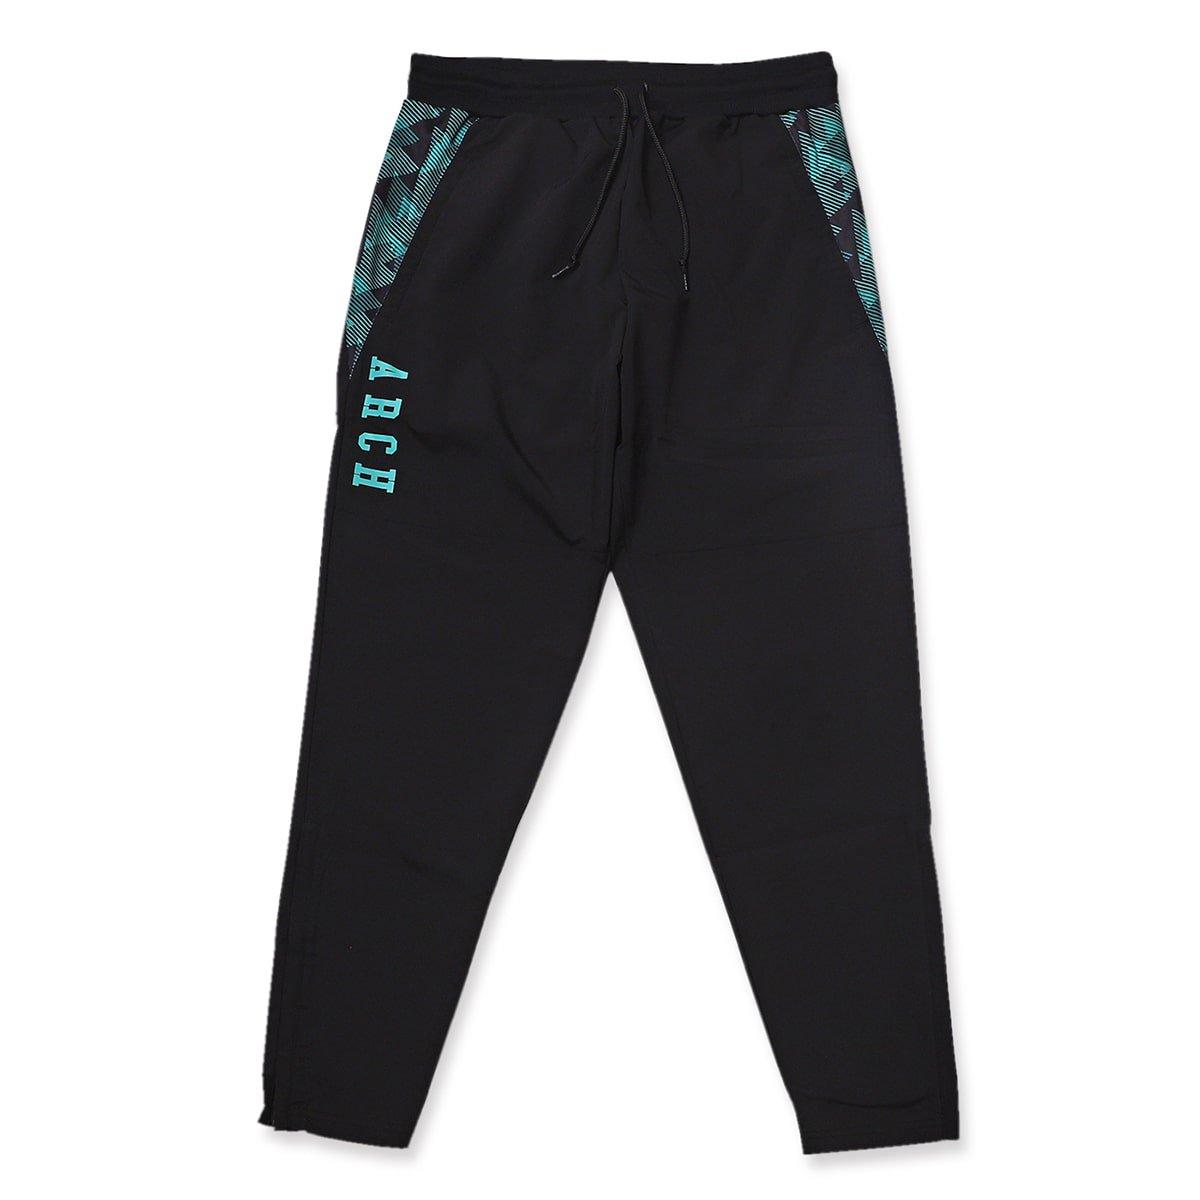 triangle native warmup pants【black】